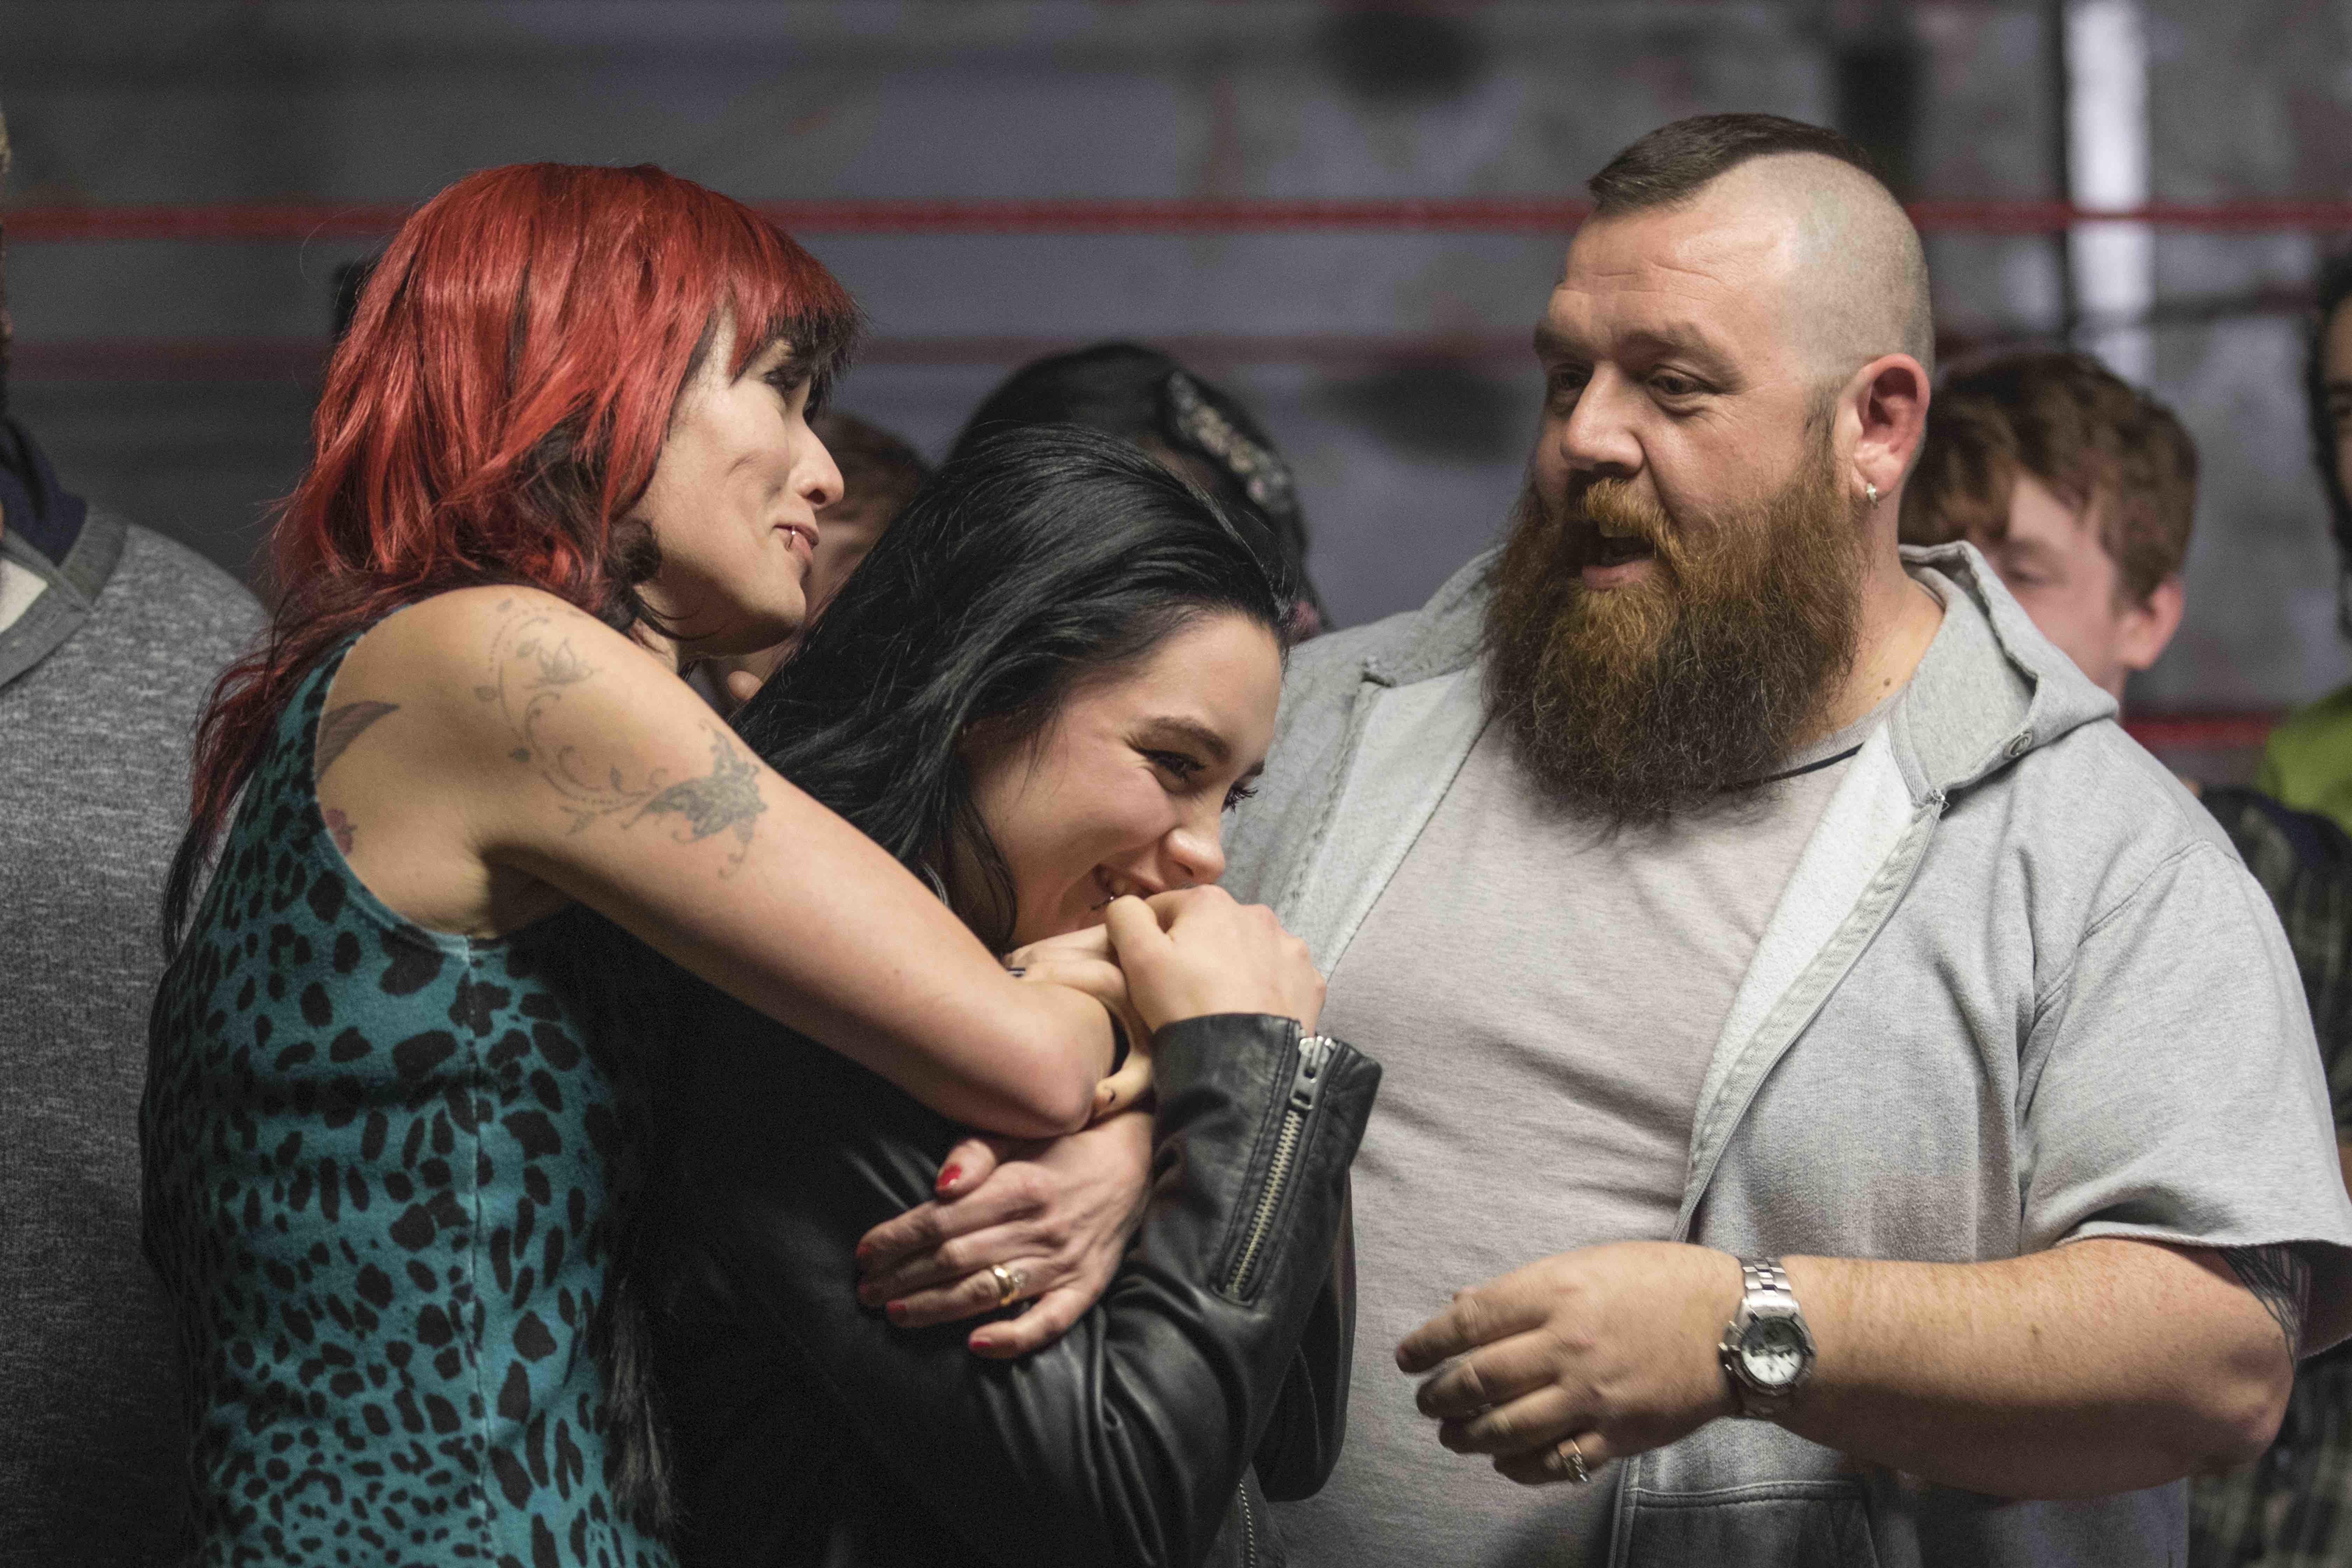 (C)2019 METRO-GOLDWYN-MAYER PICTURES INC., WWE STUDIOS FINANCE CORP. AND FILM4,